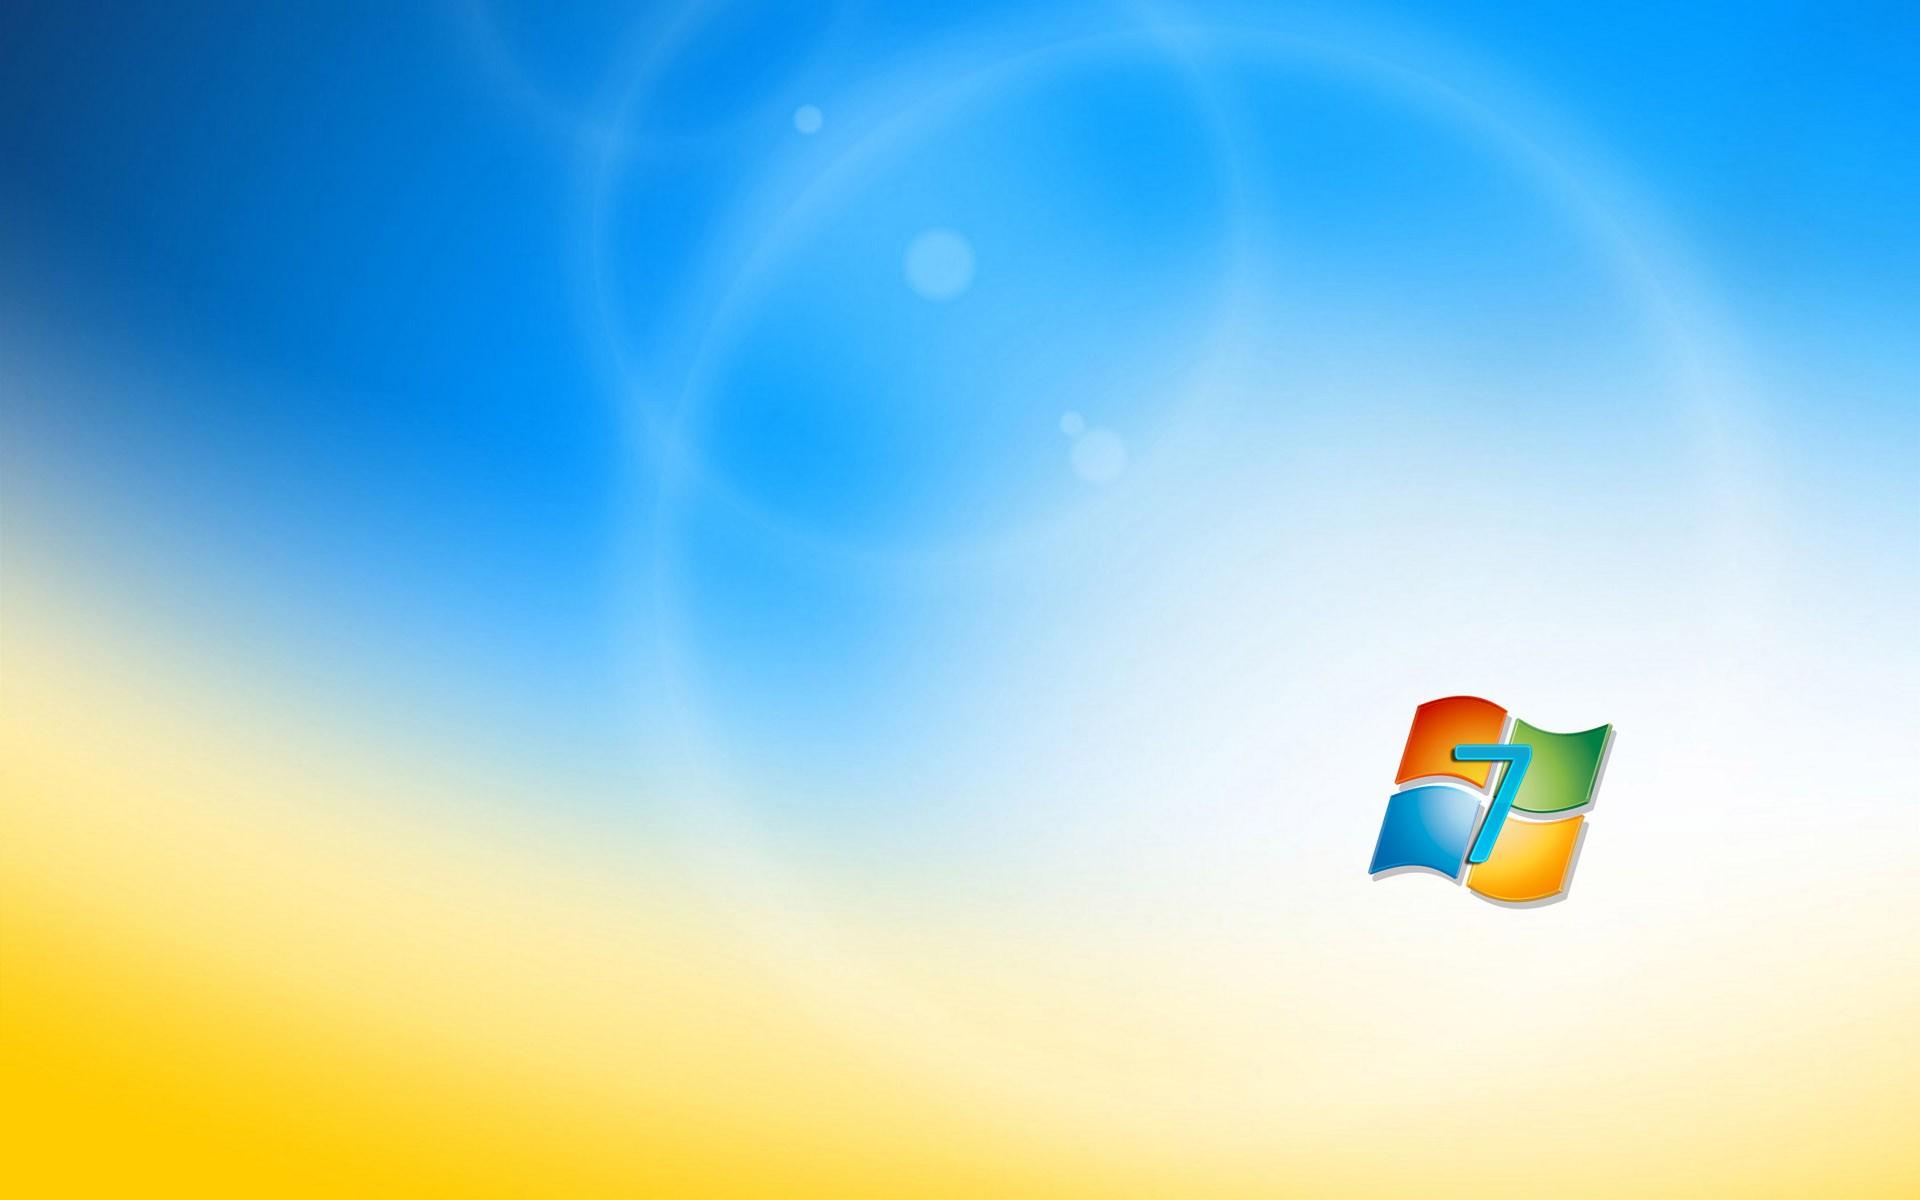 Full-HD-Computers-Microsoft-Windows-Vista-Buttons-wallpaper-wpc5805240